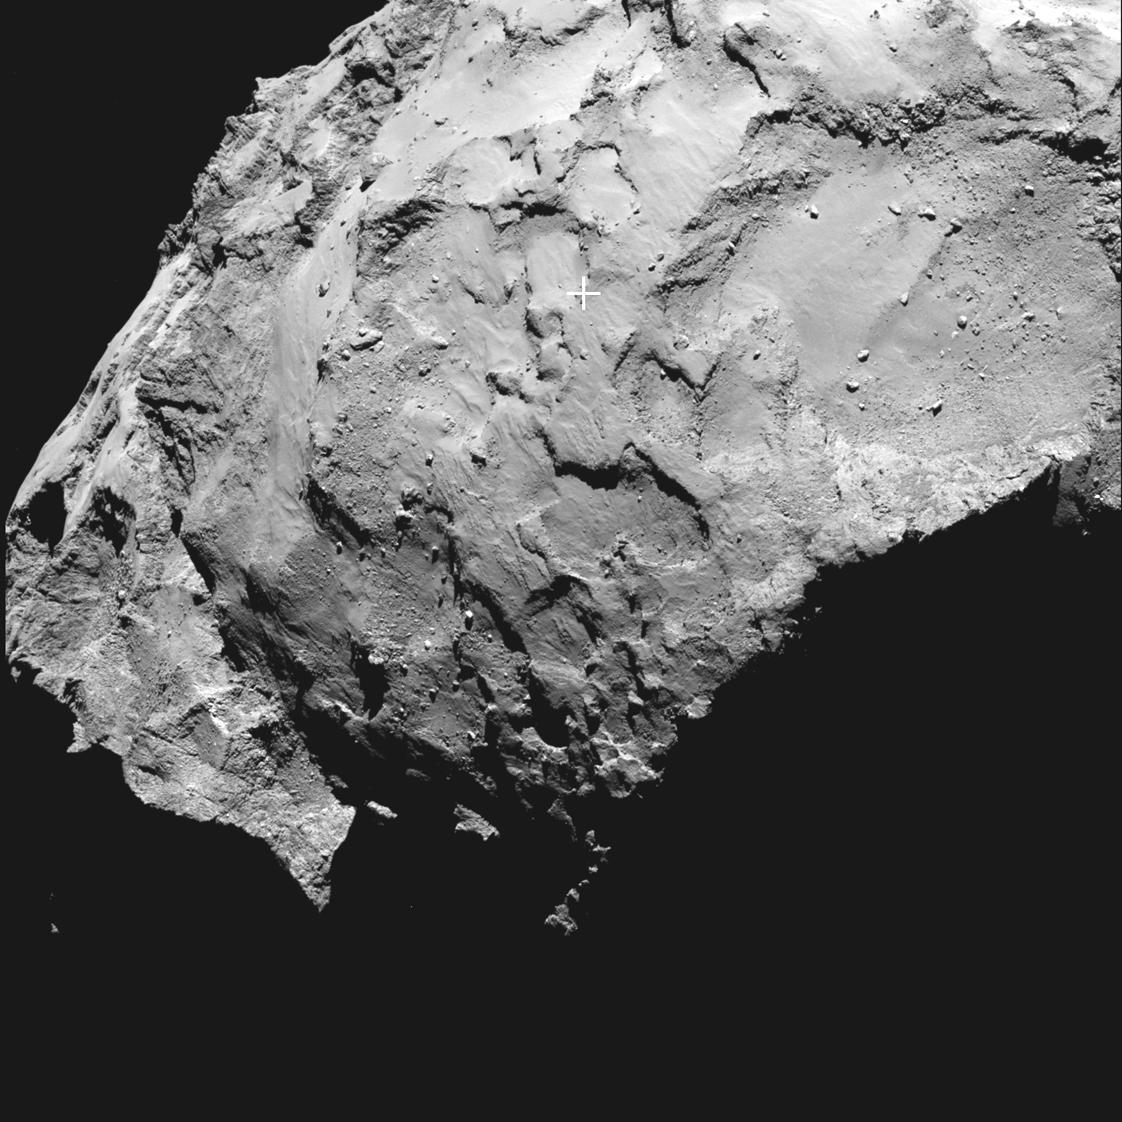 Comet's Head Selected as Landing Site for Rosetta's ...